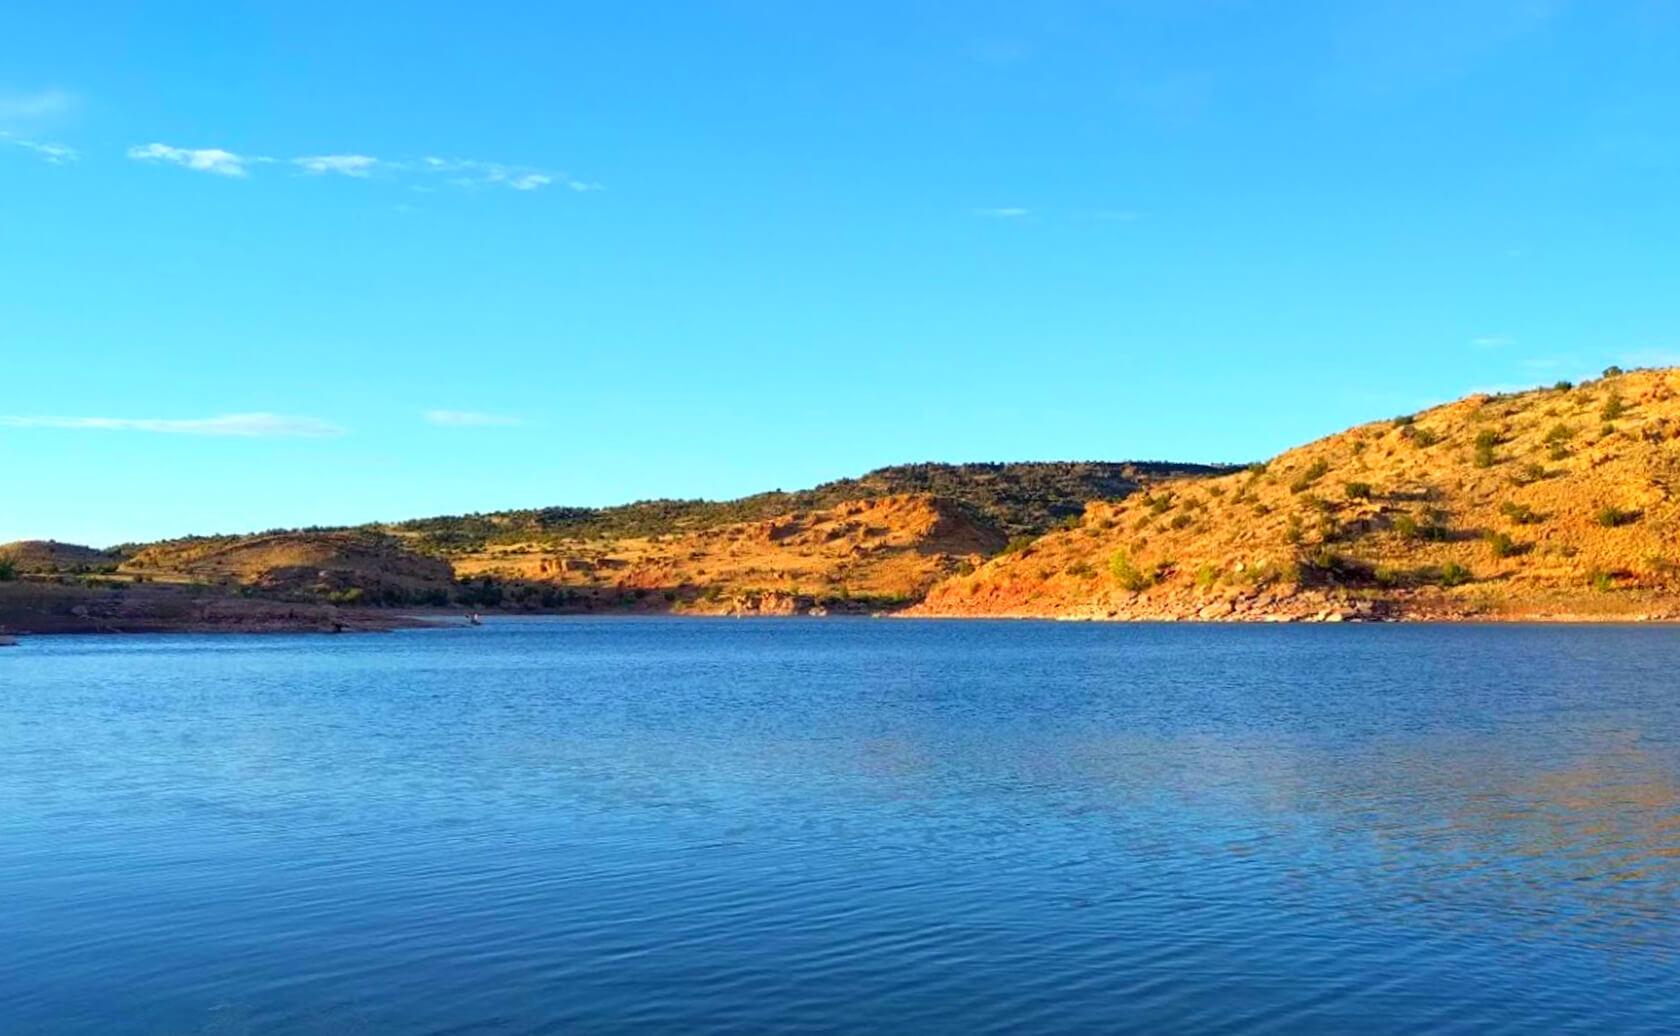 Lyman-Lake-Fishing-Guide-Report-St-Johns-AZ-03